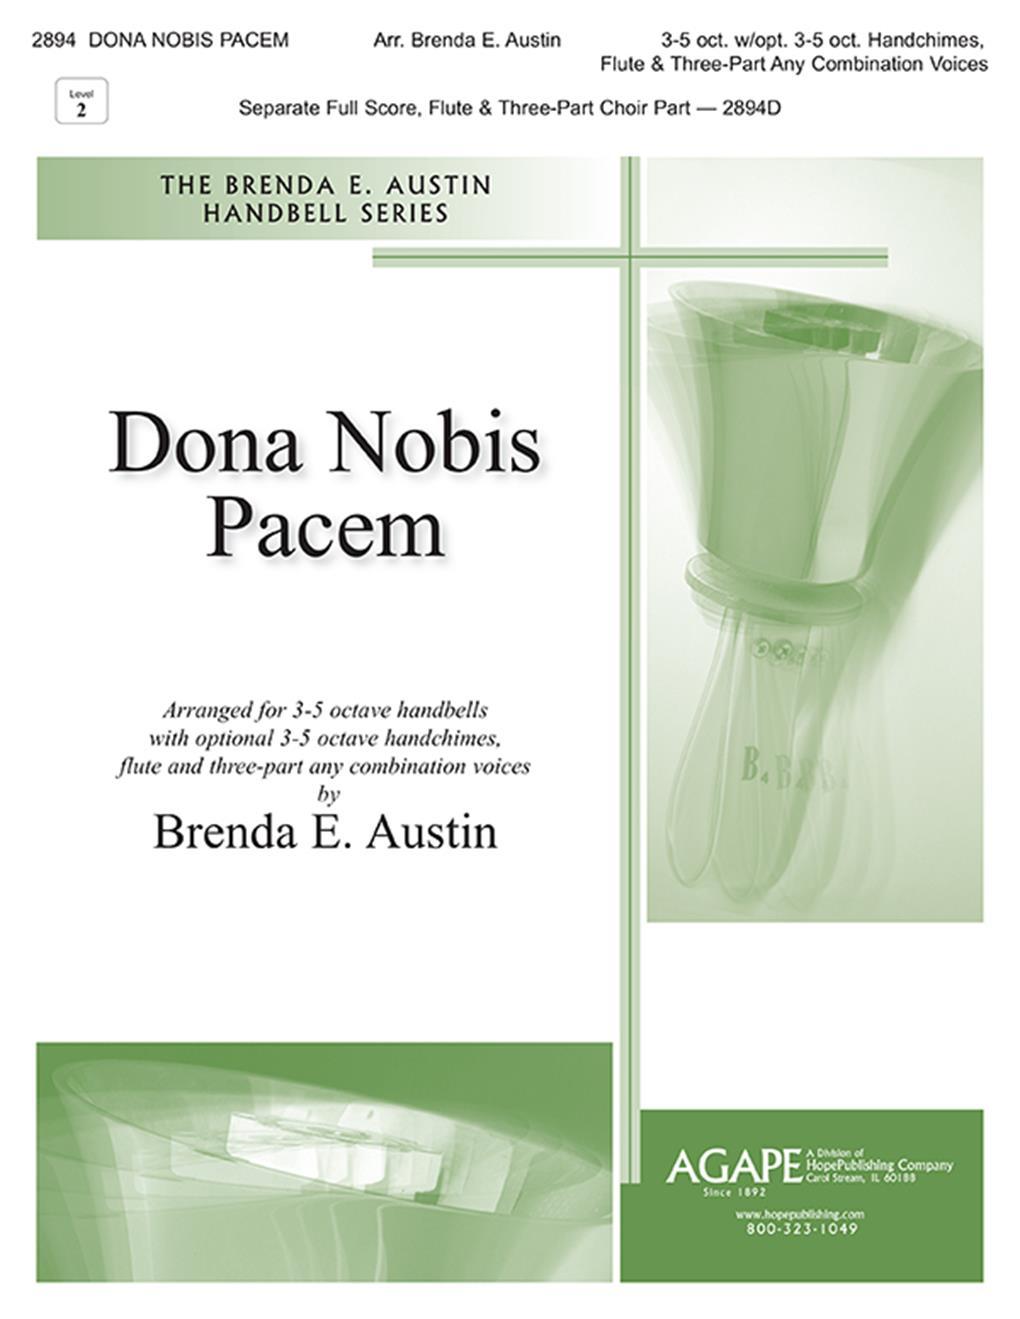 Dona Nobis Pacem - 3-5 Oct. Cover Image